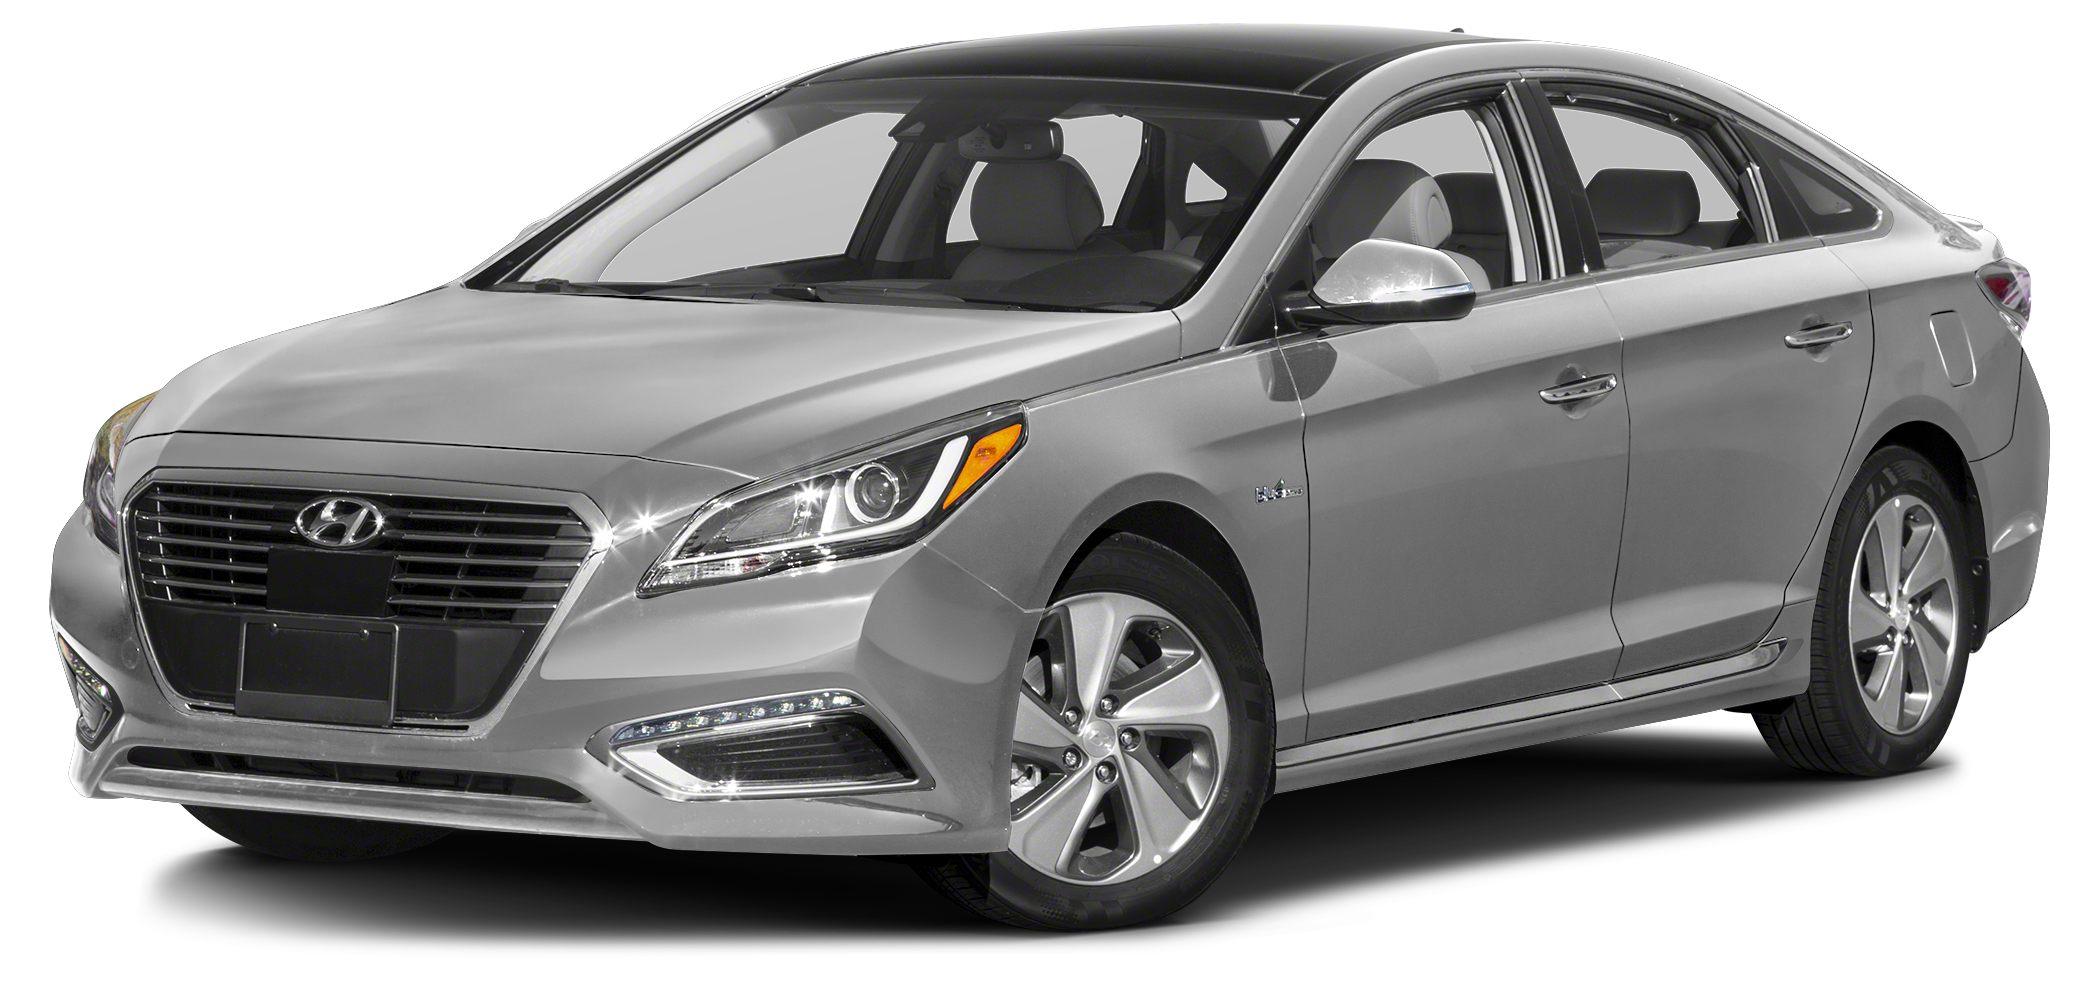 2017 Hyundai Sonata Hybrid Limited Miles 1801Color Ion Silver Stock H40102 VIN KMHE34L13HA05